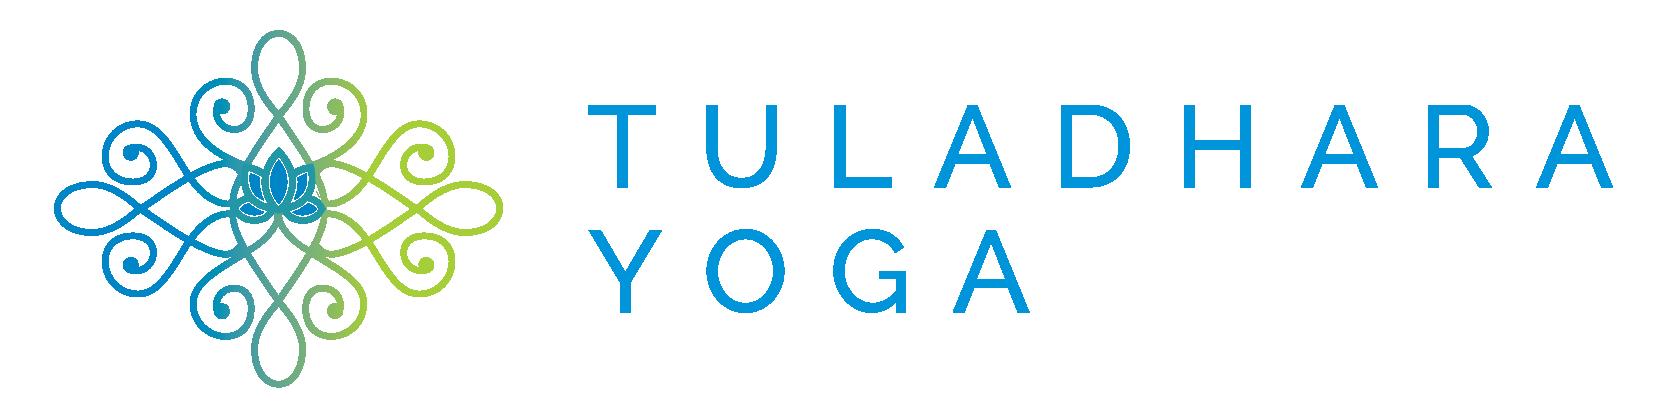 Tuladhara Yoga Studio